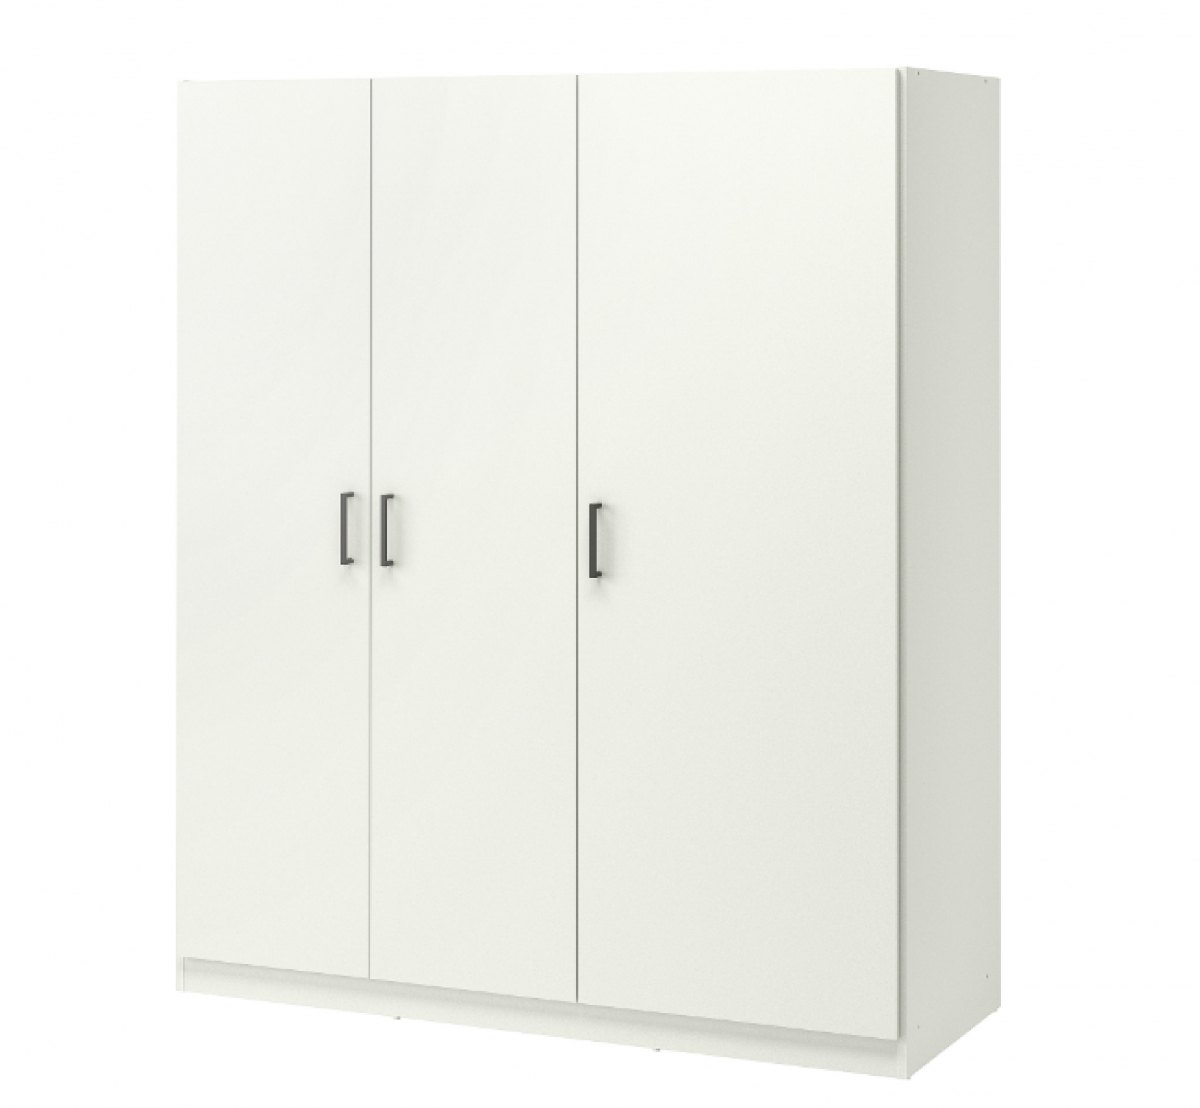 visthus IKEA VISTHUS 50270136